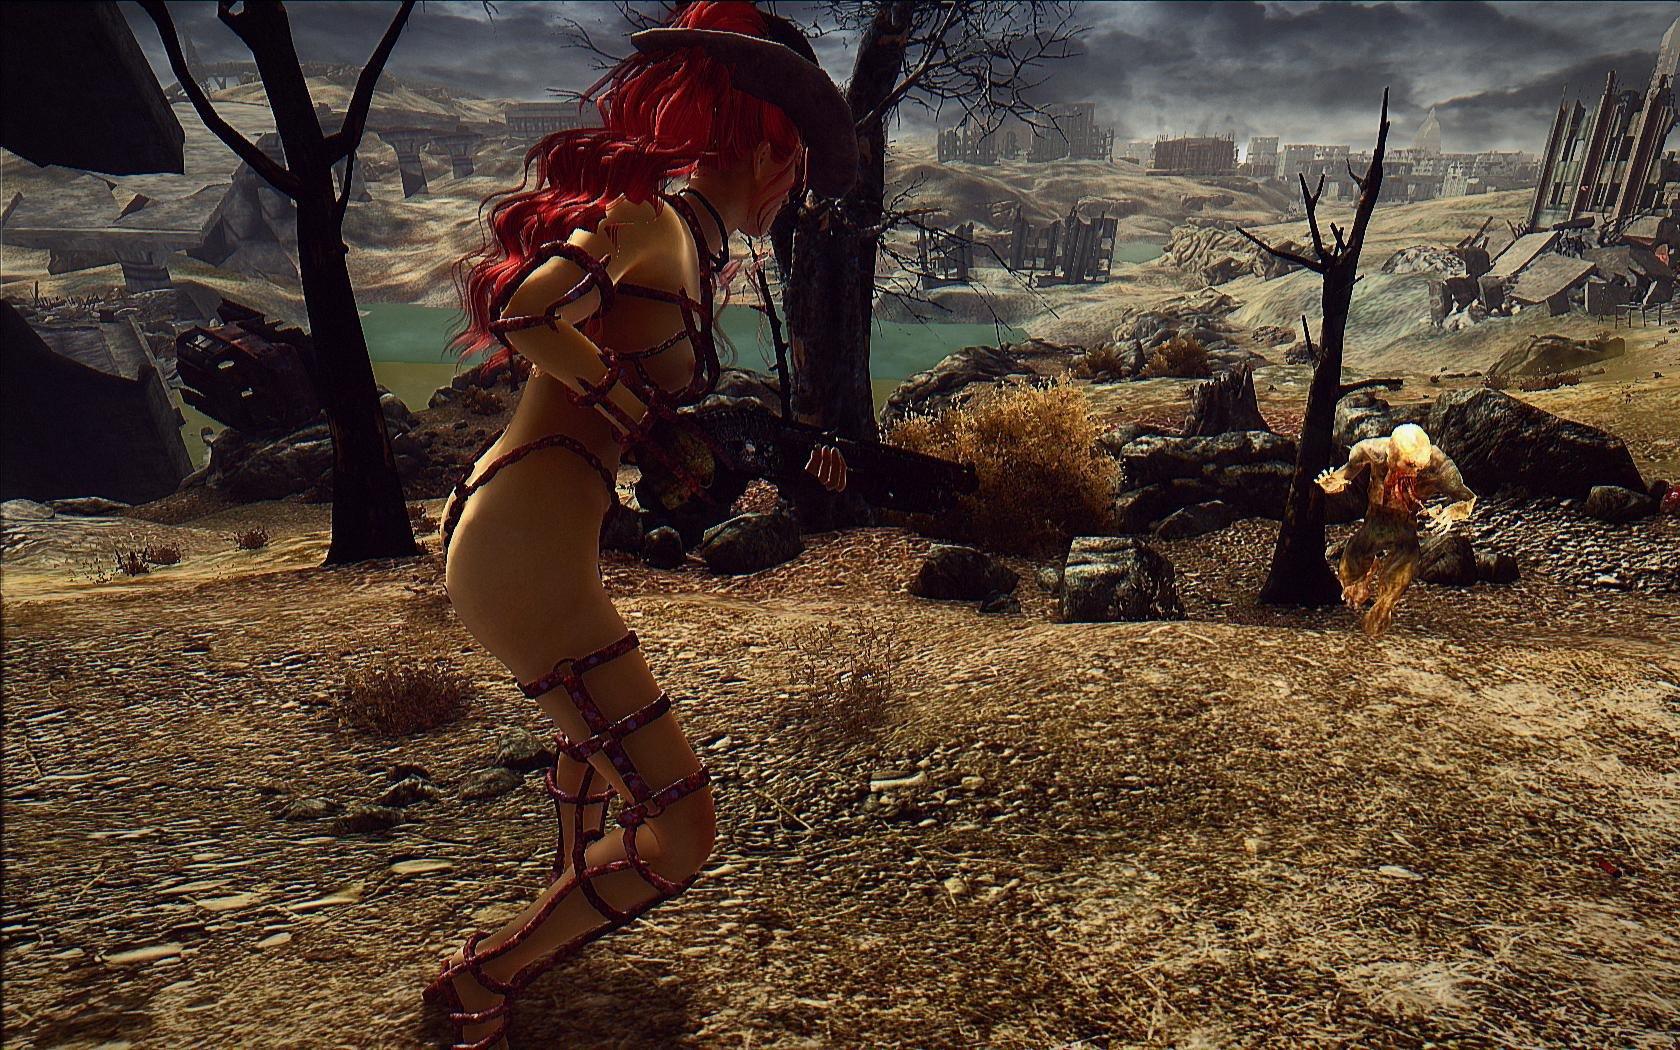 Fallout3 2019-04-10 12-59-11-92